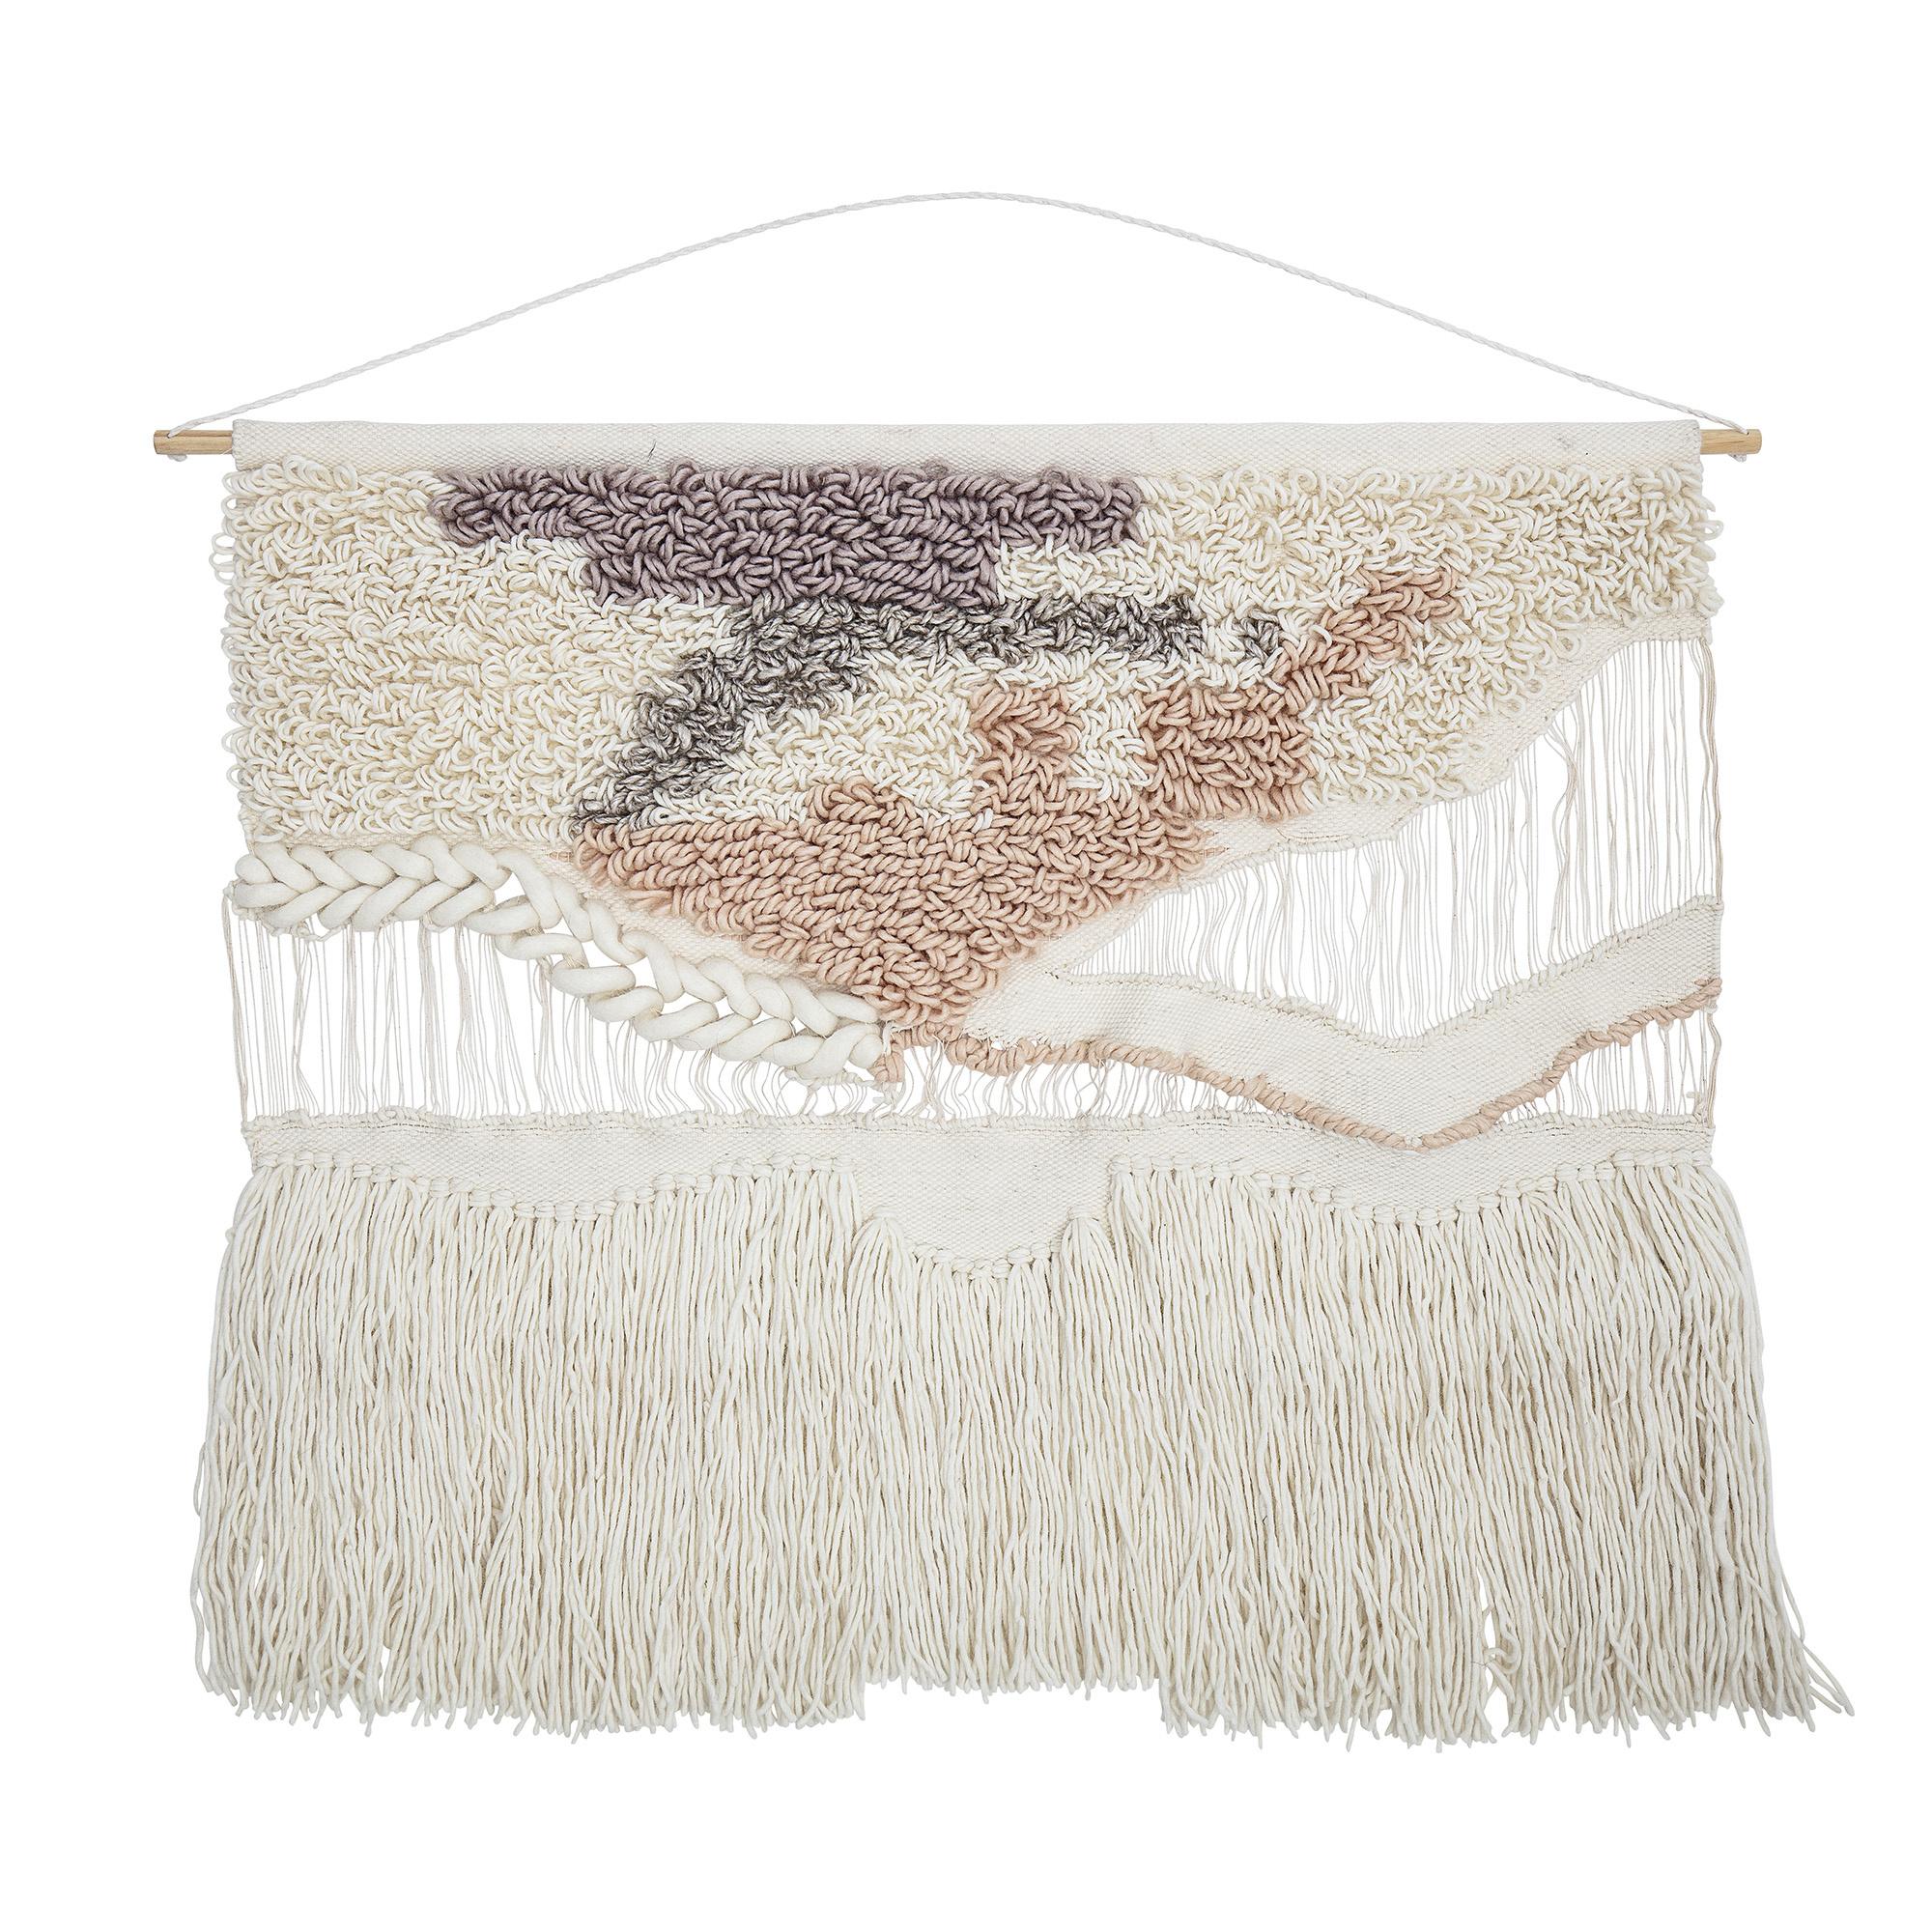 Bloomingville Colgadura de lana - blanca - H95xW105cm - Bloomingville